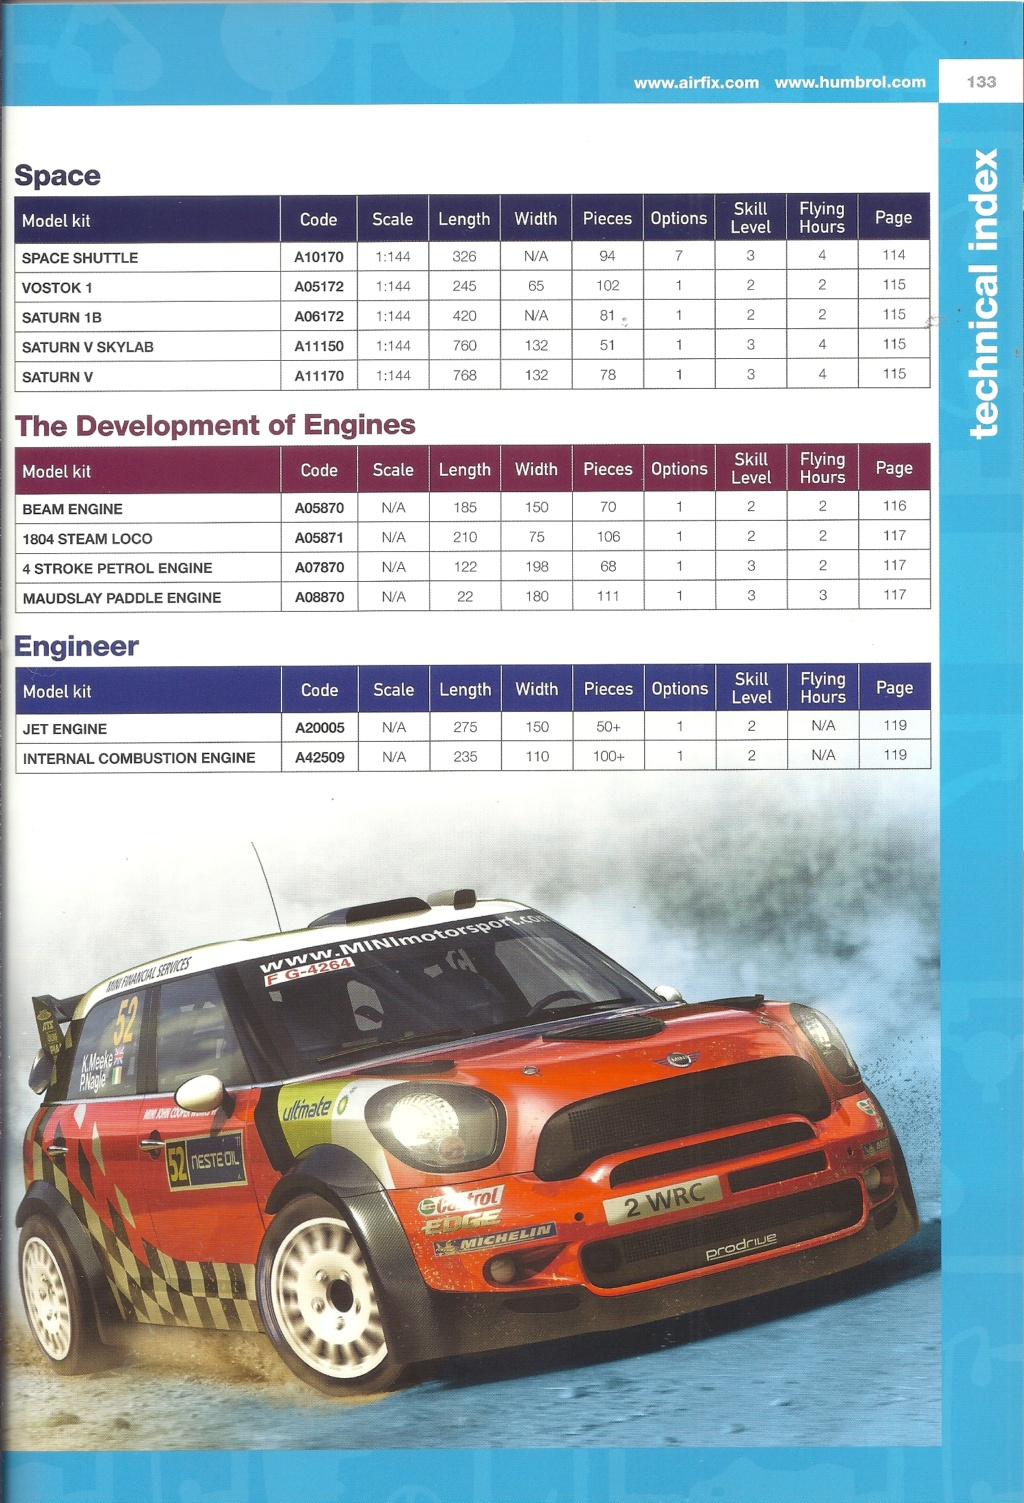 [AIRFIX 2013] Catalogue 2013 Airf1824